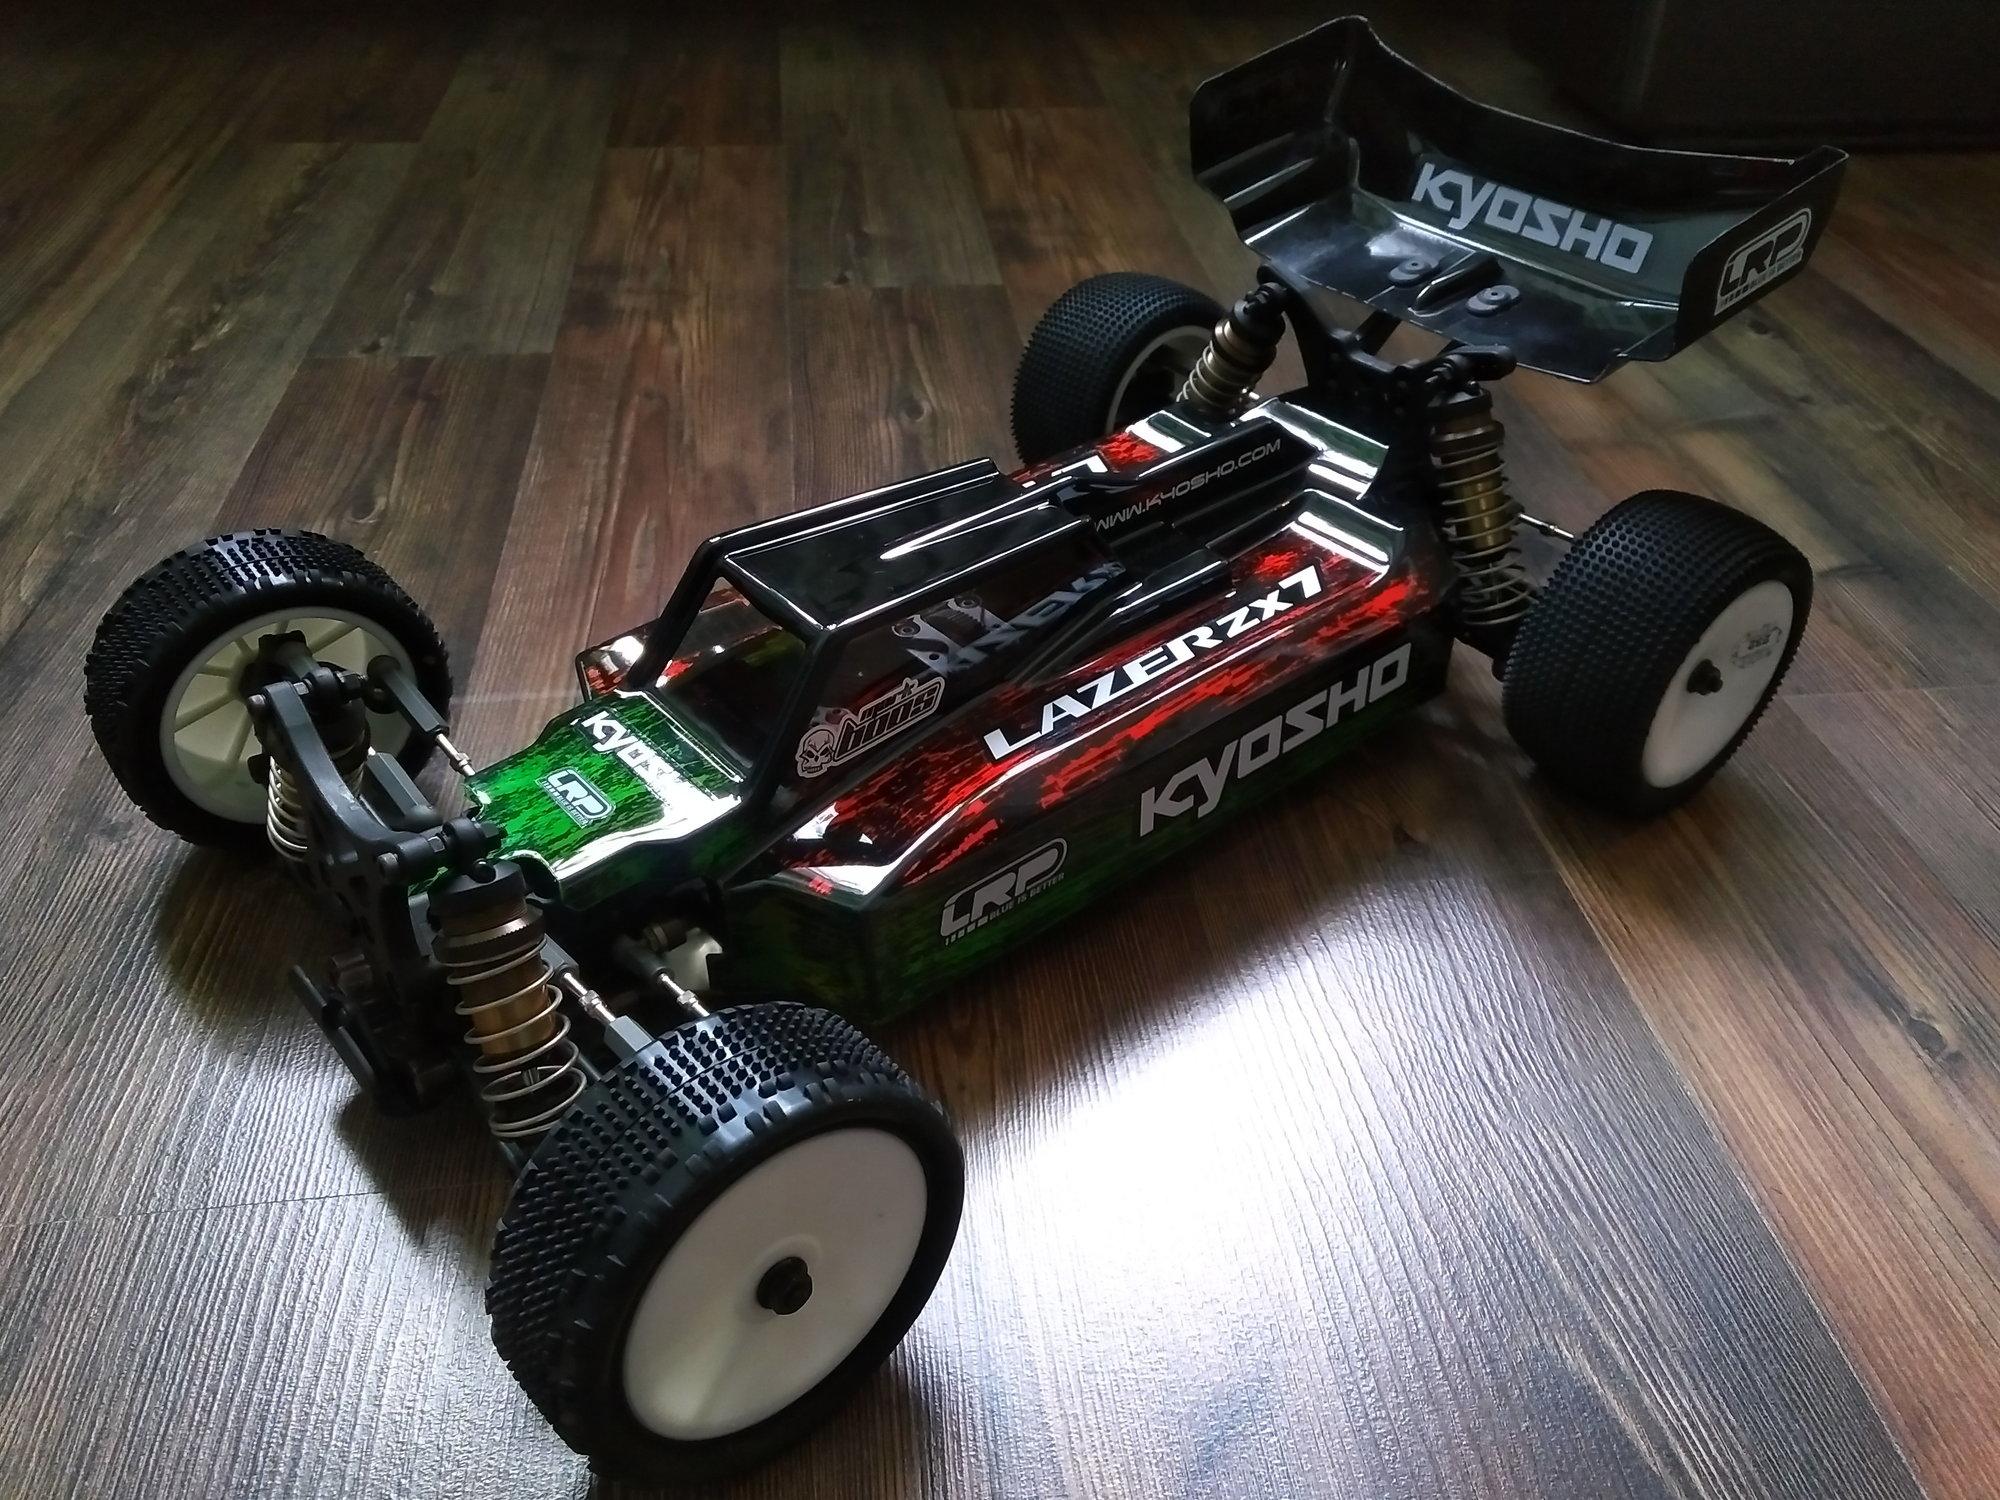 Kyosho Lazer ZX7 Thread - R/C Tech Forums